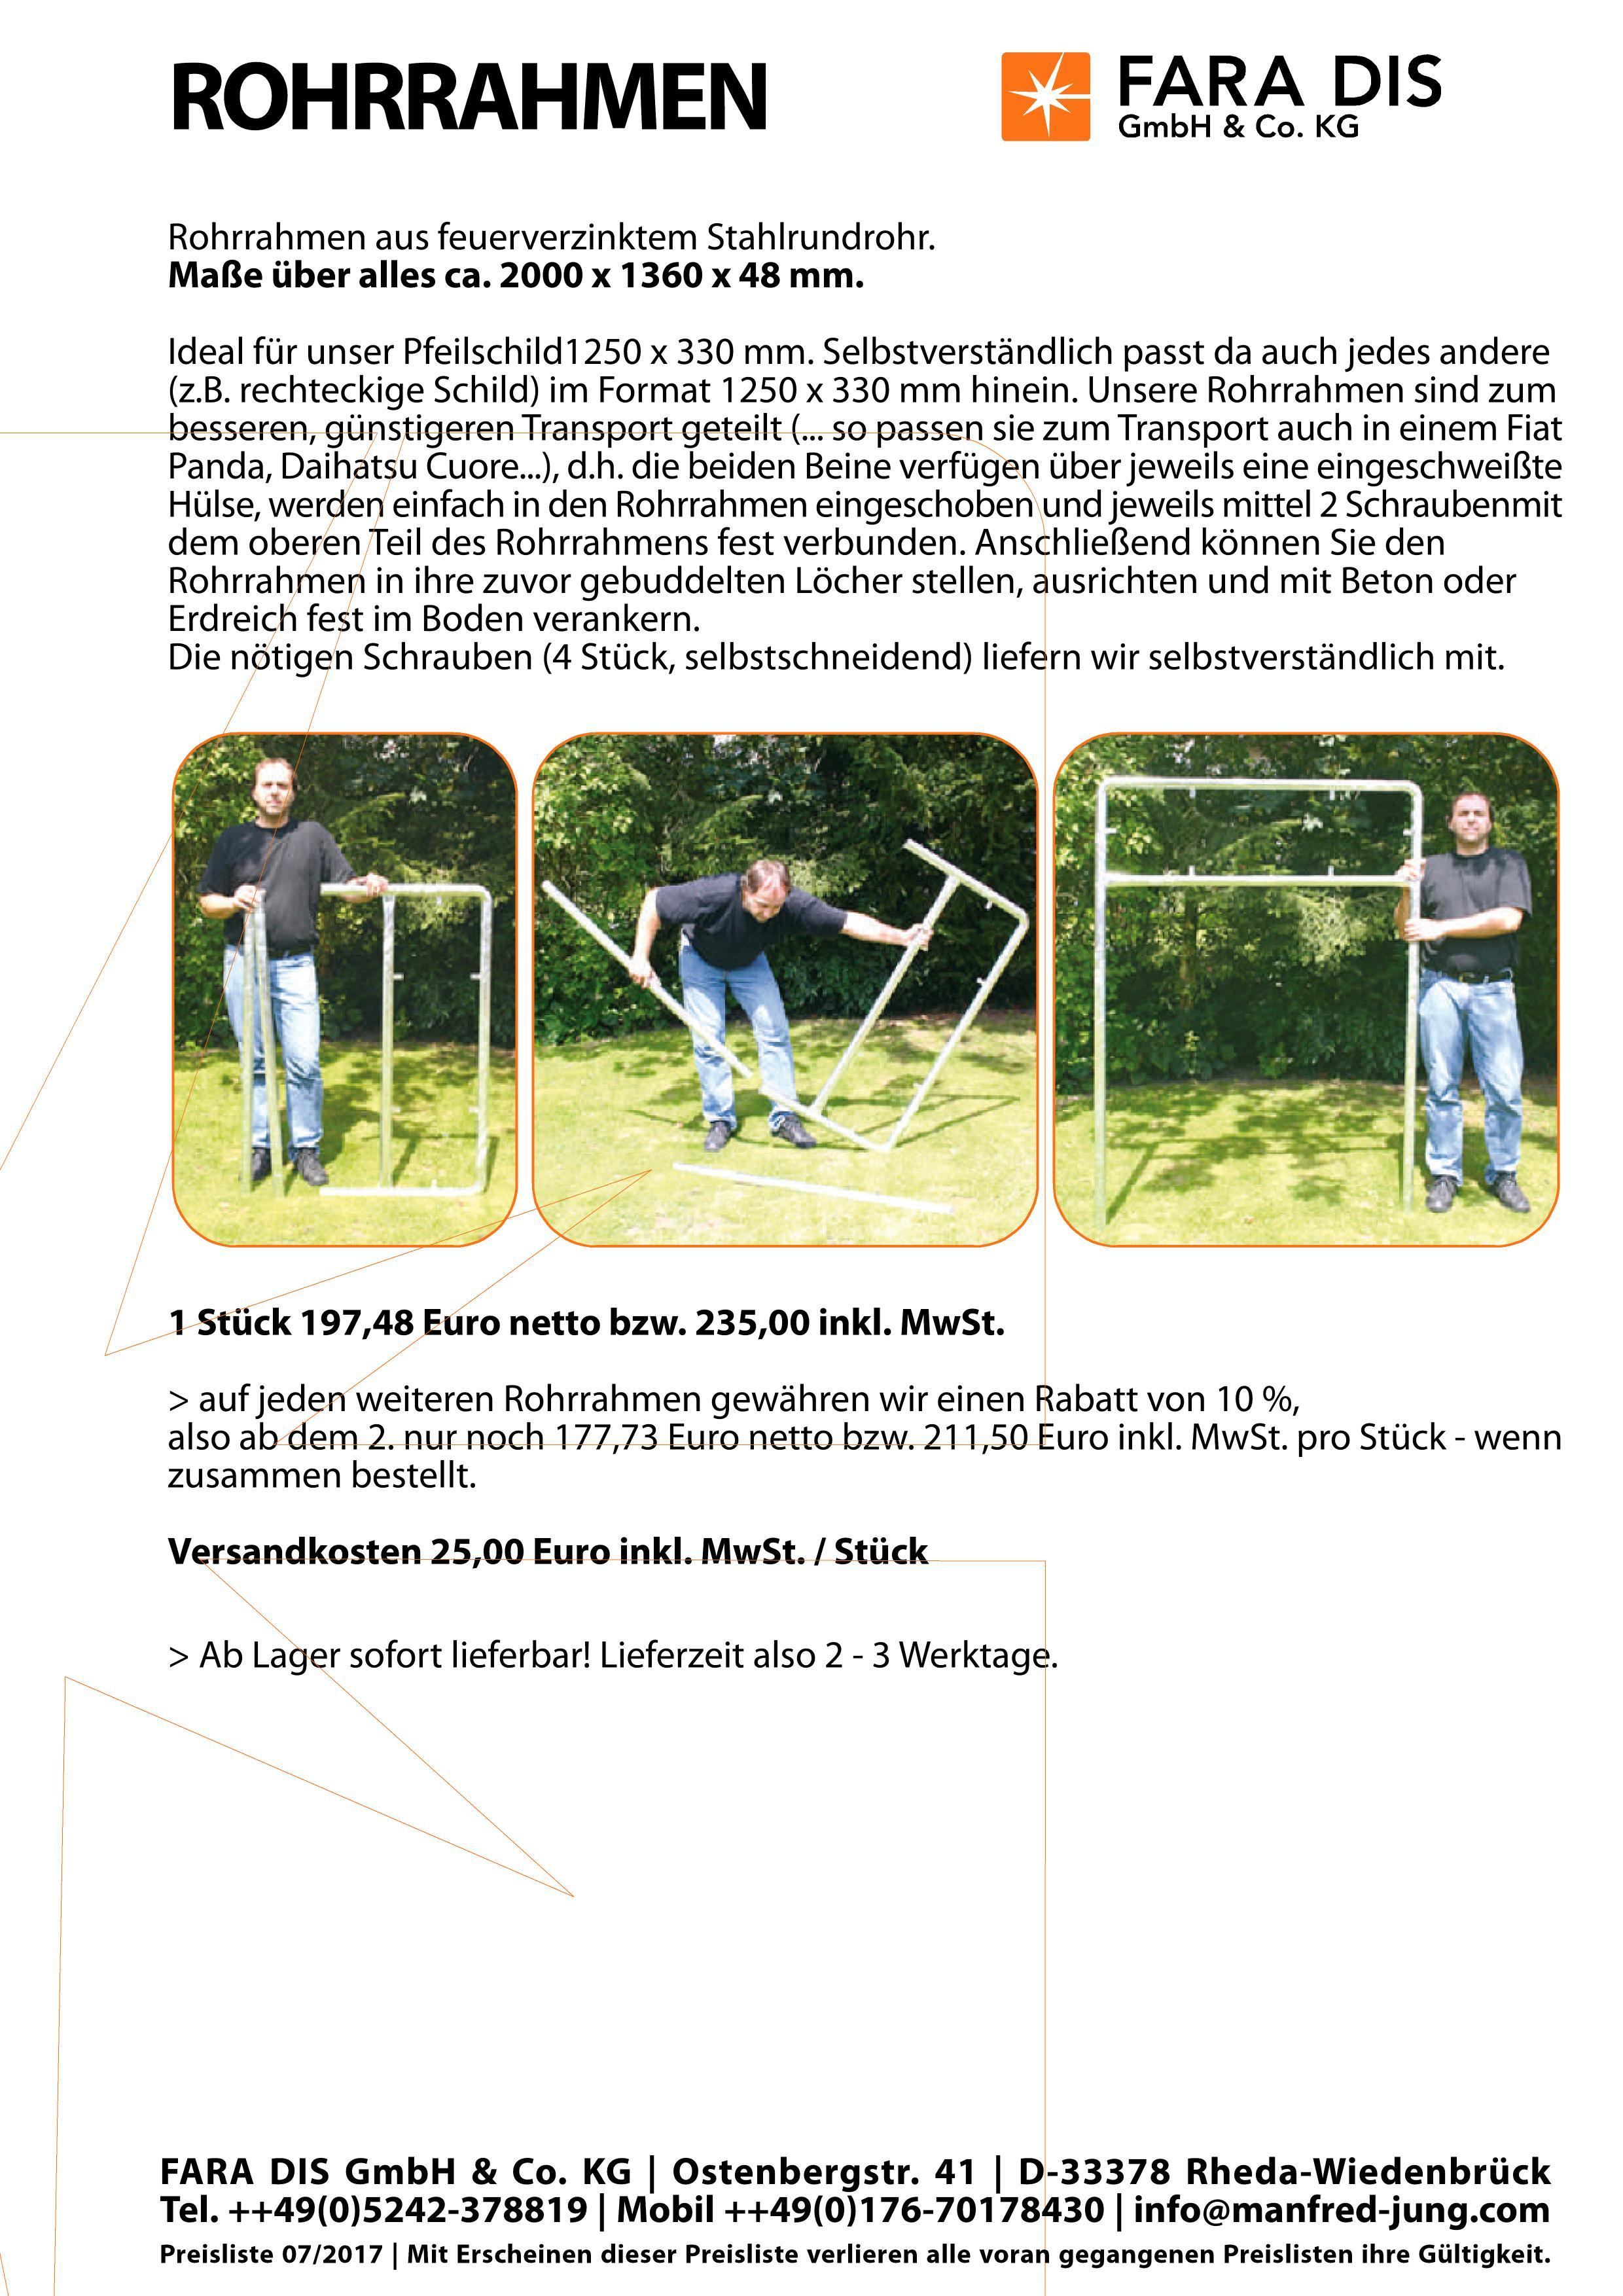 Rohrrahmen geteilt   FARA DIS GmbH & Co. KG